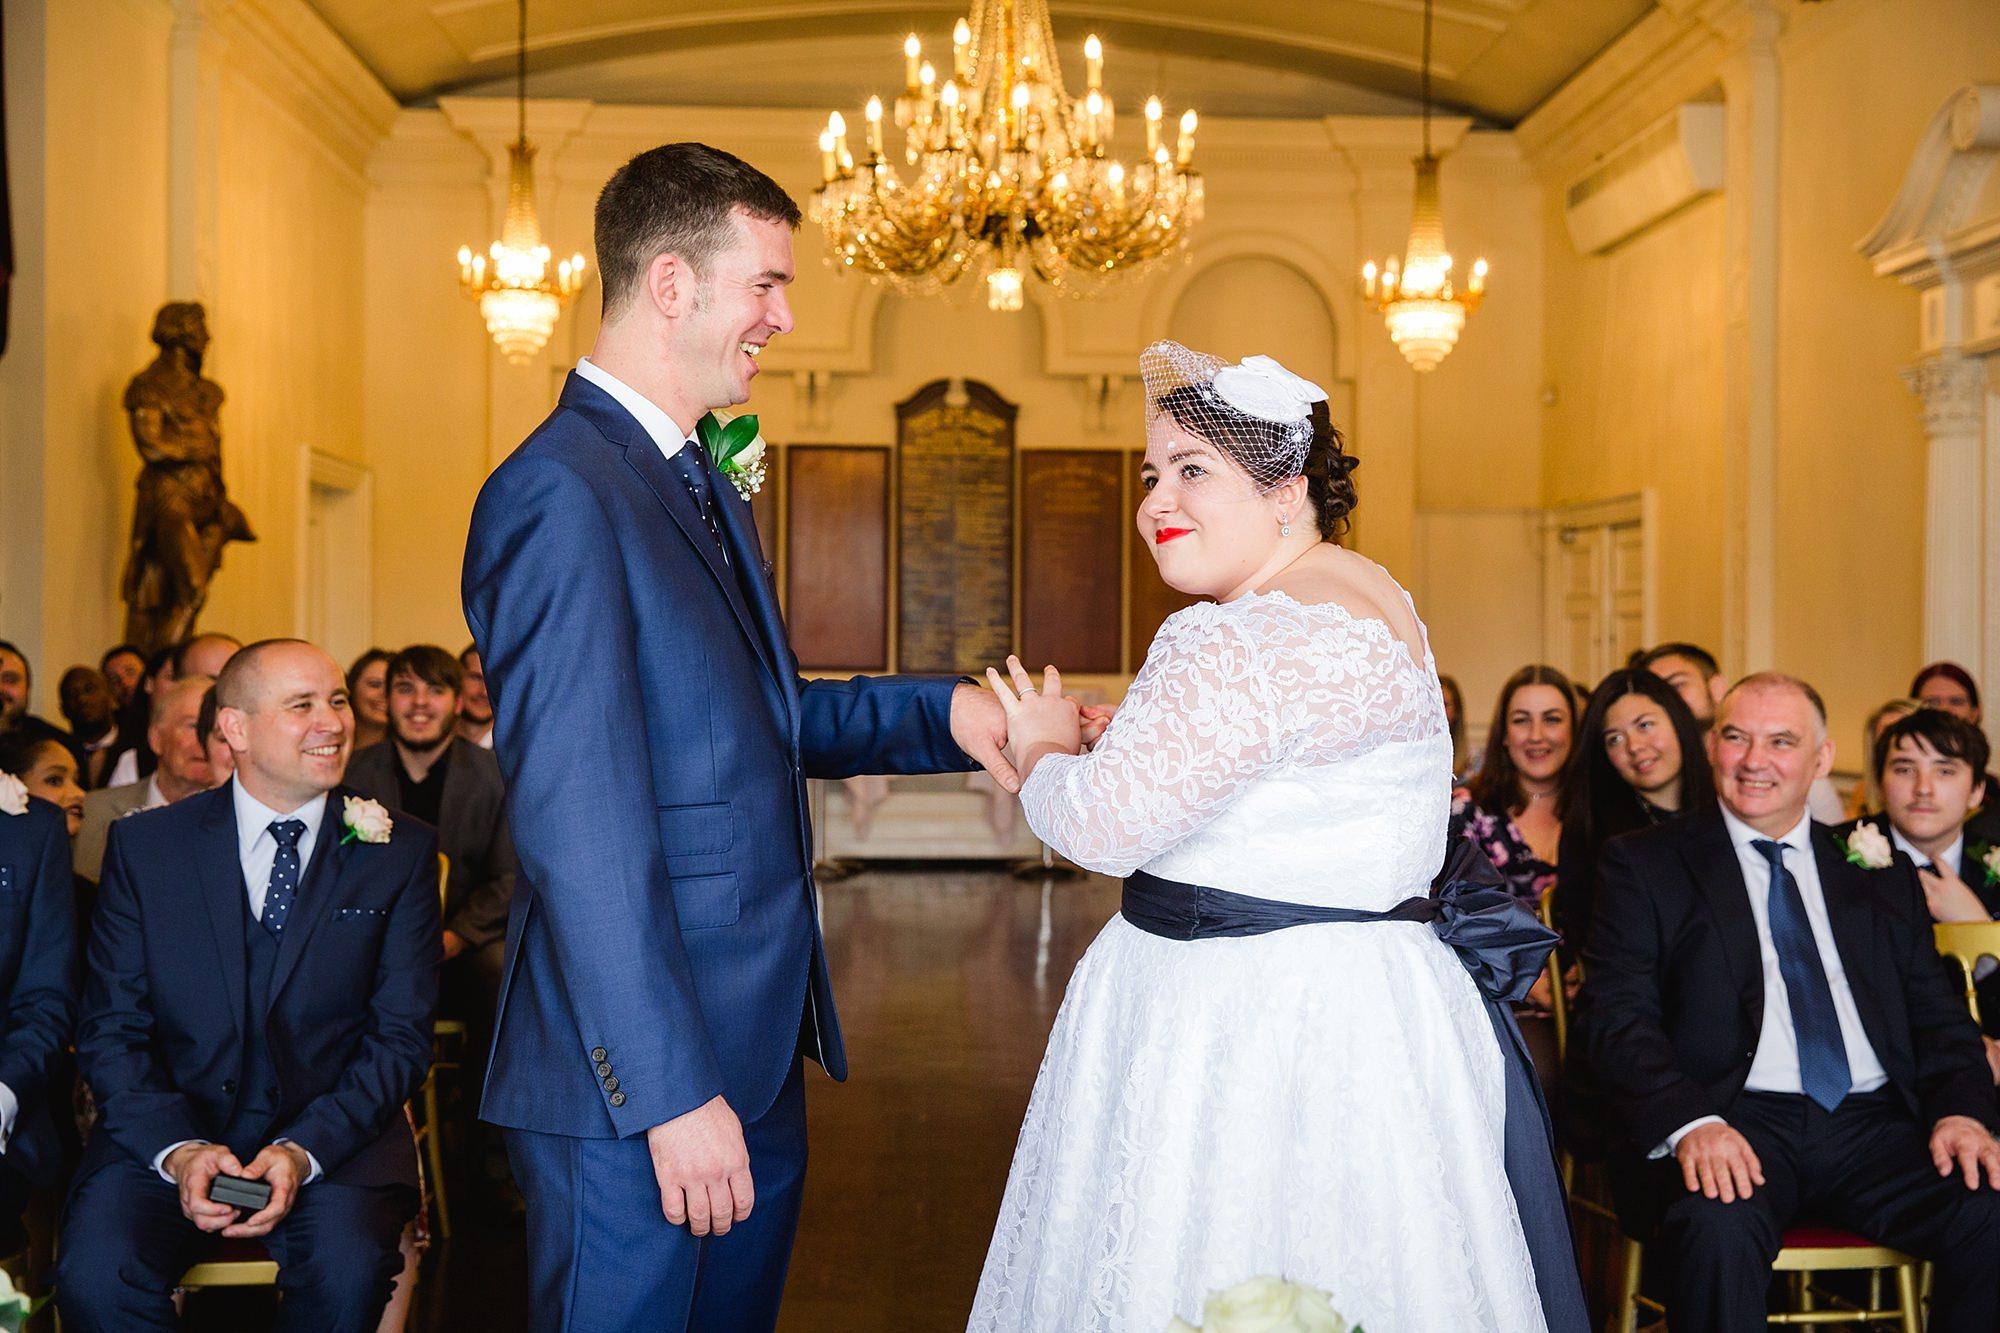 Trafalgar Tavern wedding bride giving ring to groom